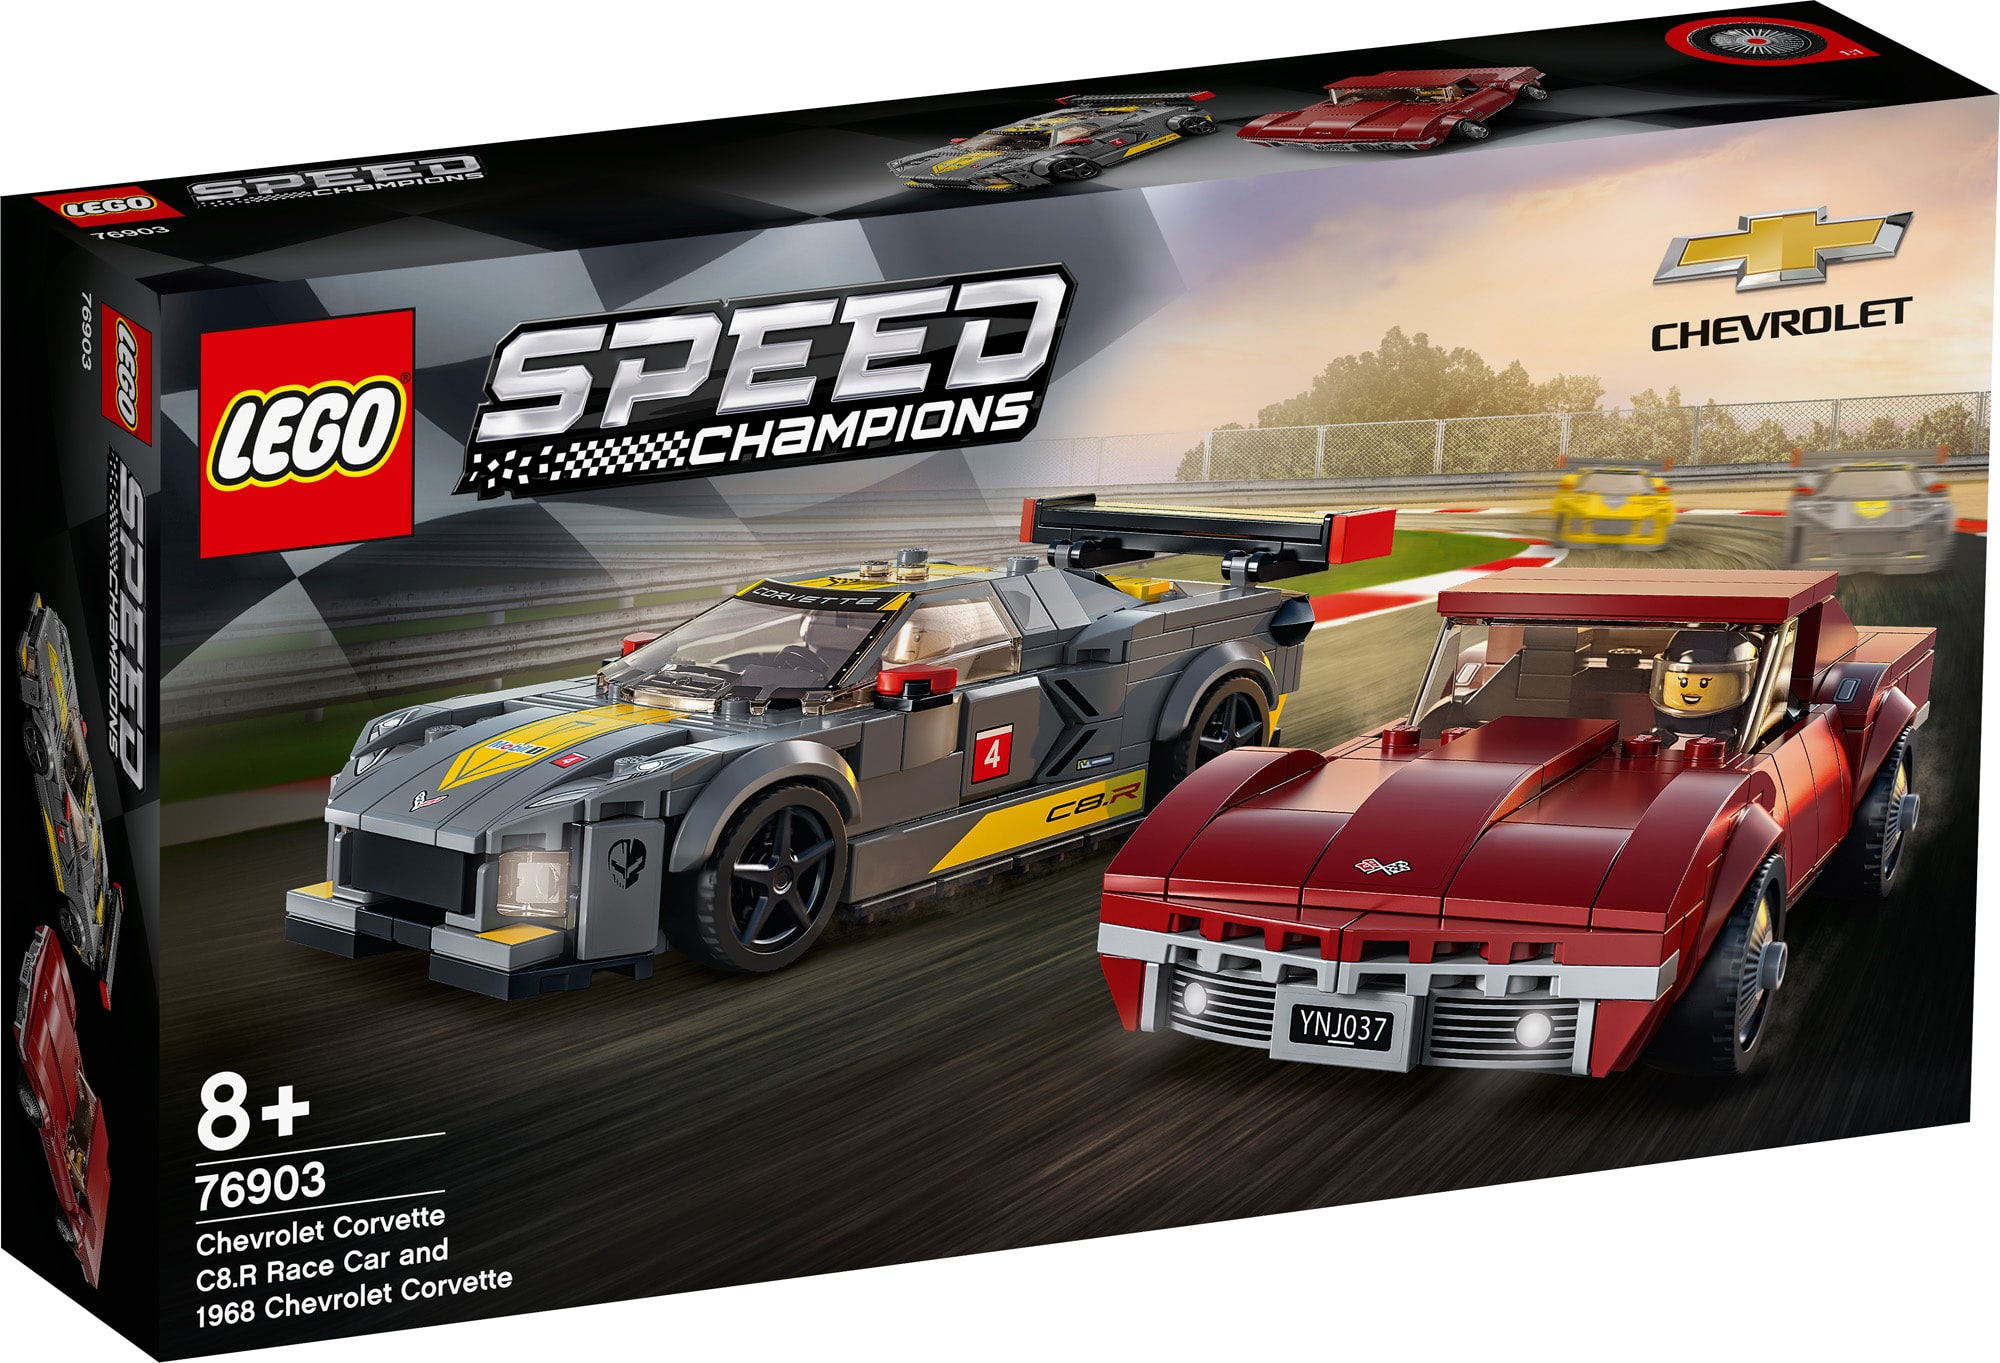 LEGO Speed Champions 76903 Chevrolet 1